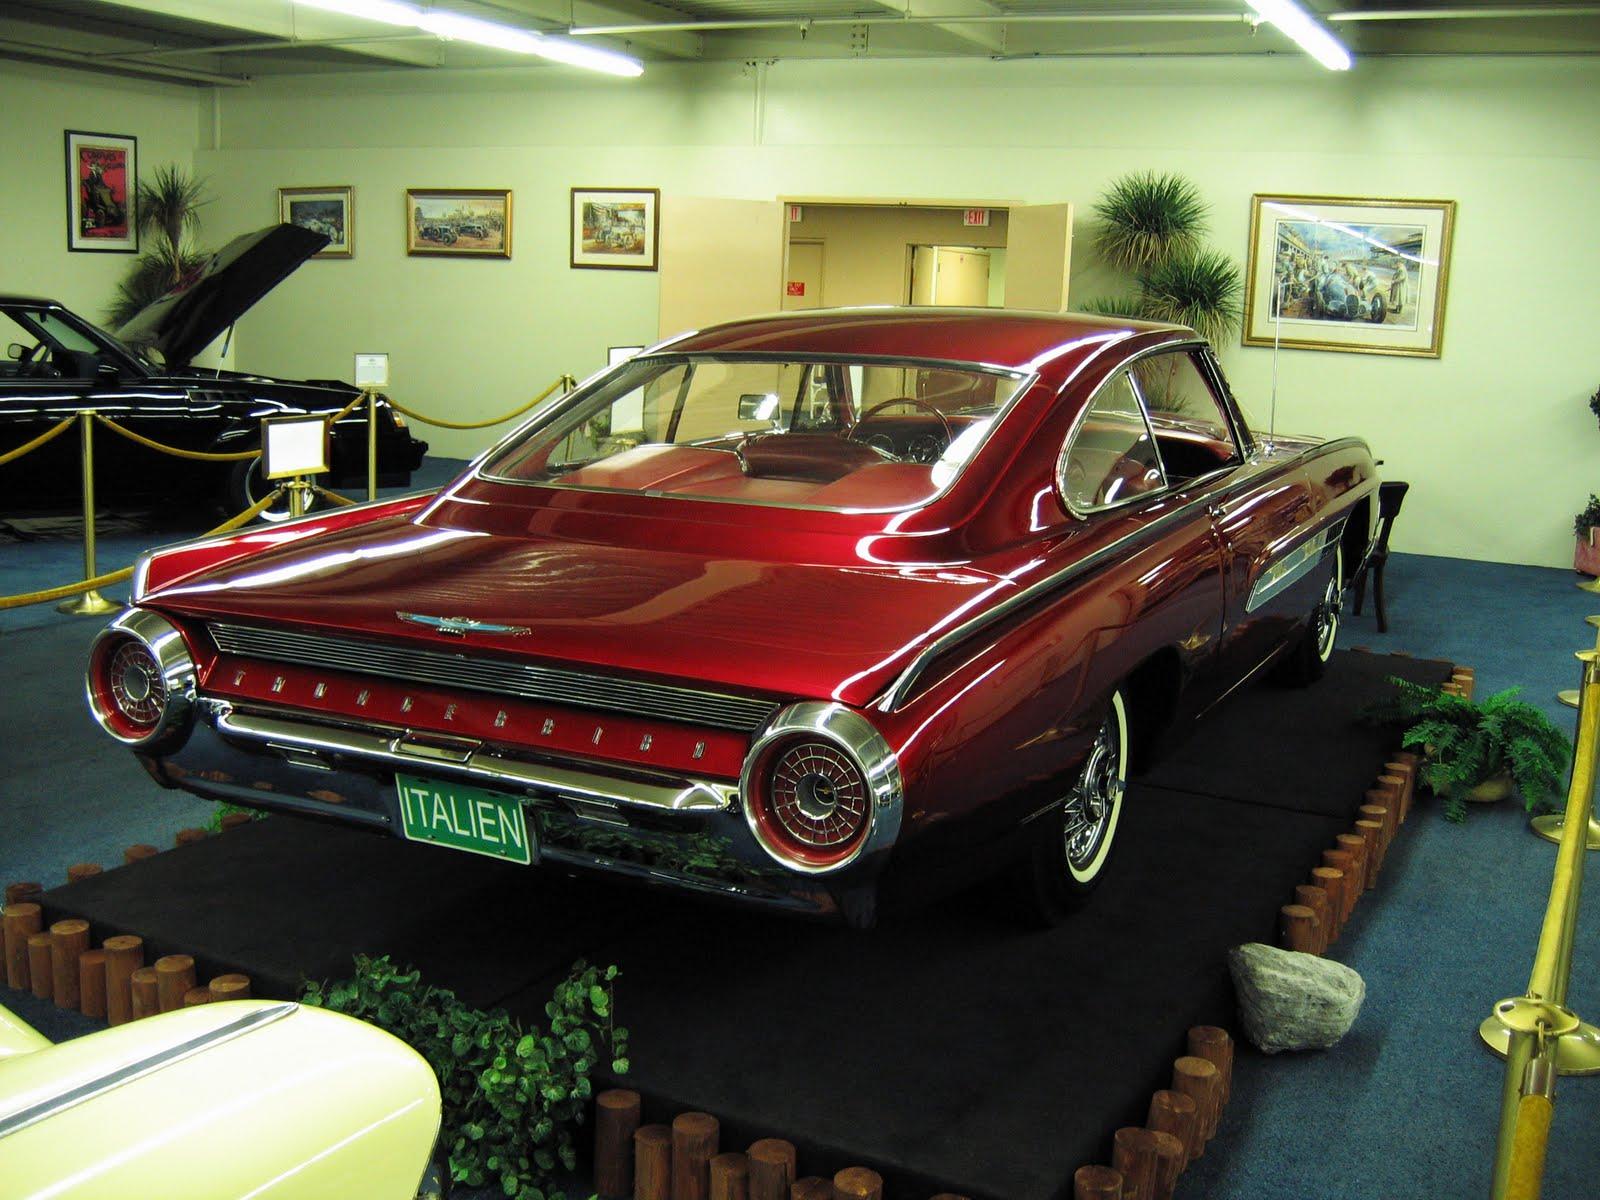 1963 Ford Thunderbird Italien Concept Car